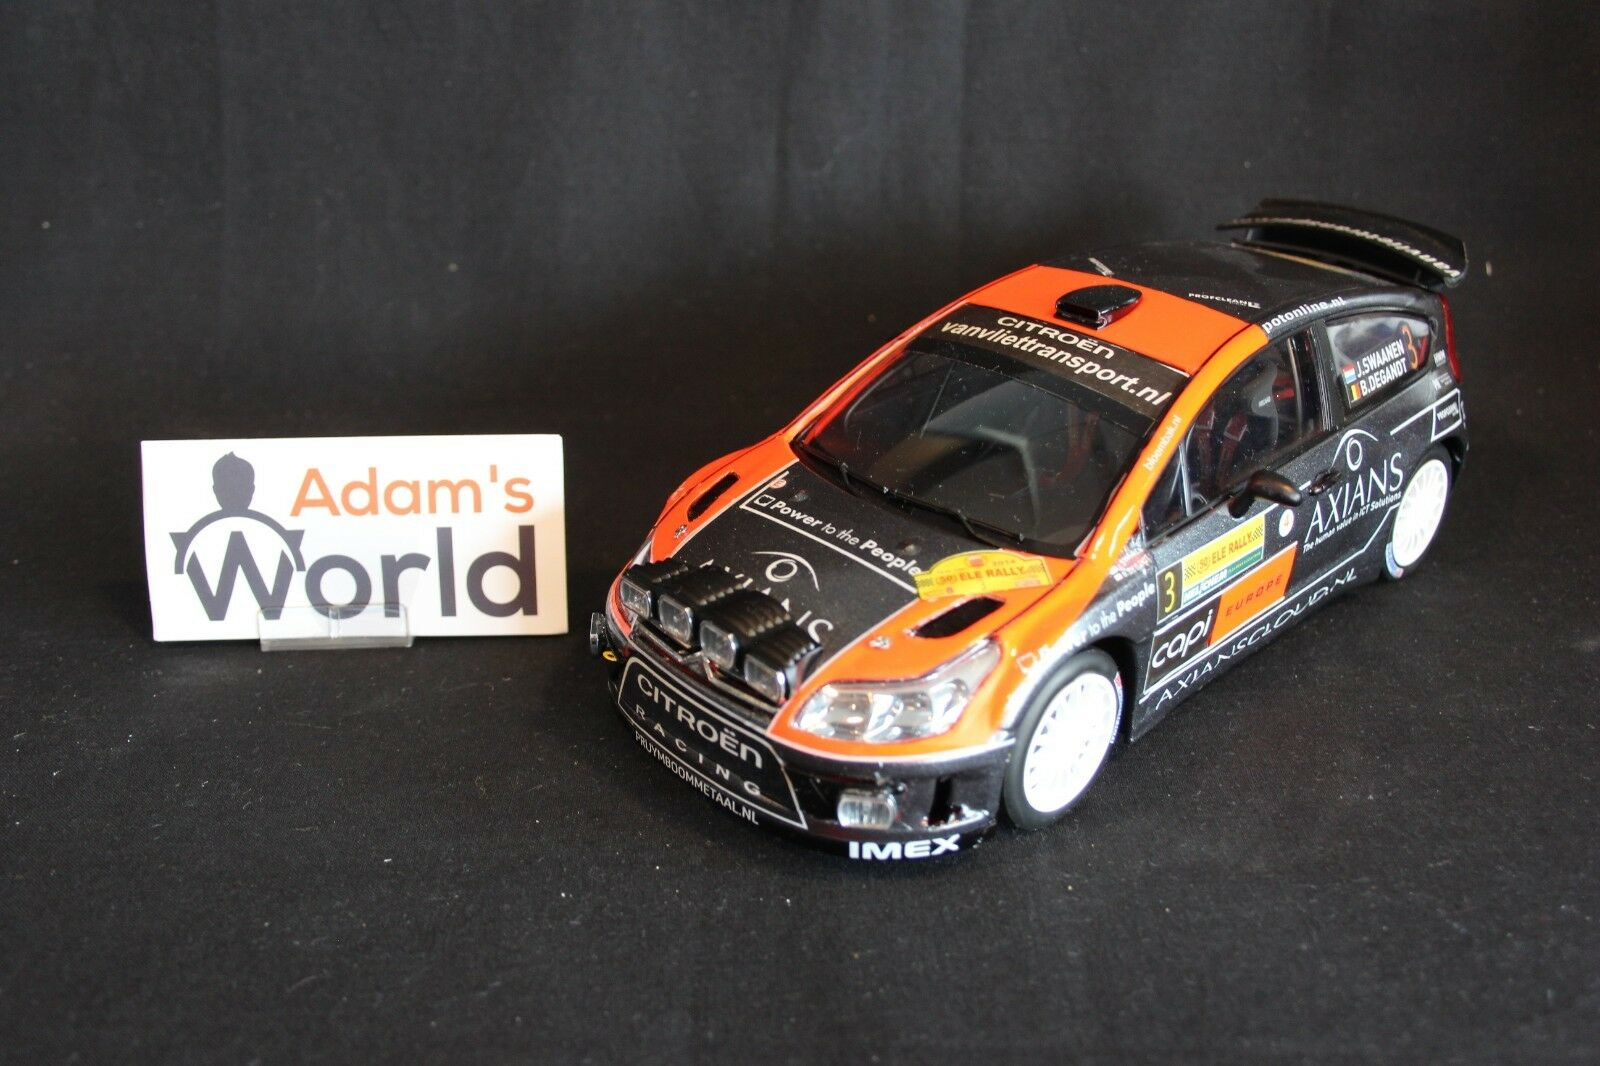 AutoArt Citroën C4 WRC 2014 1:18  3 Swaanen / Degandt ELE Rally  JvdM  NR